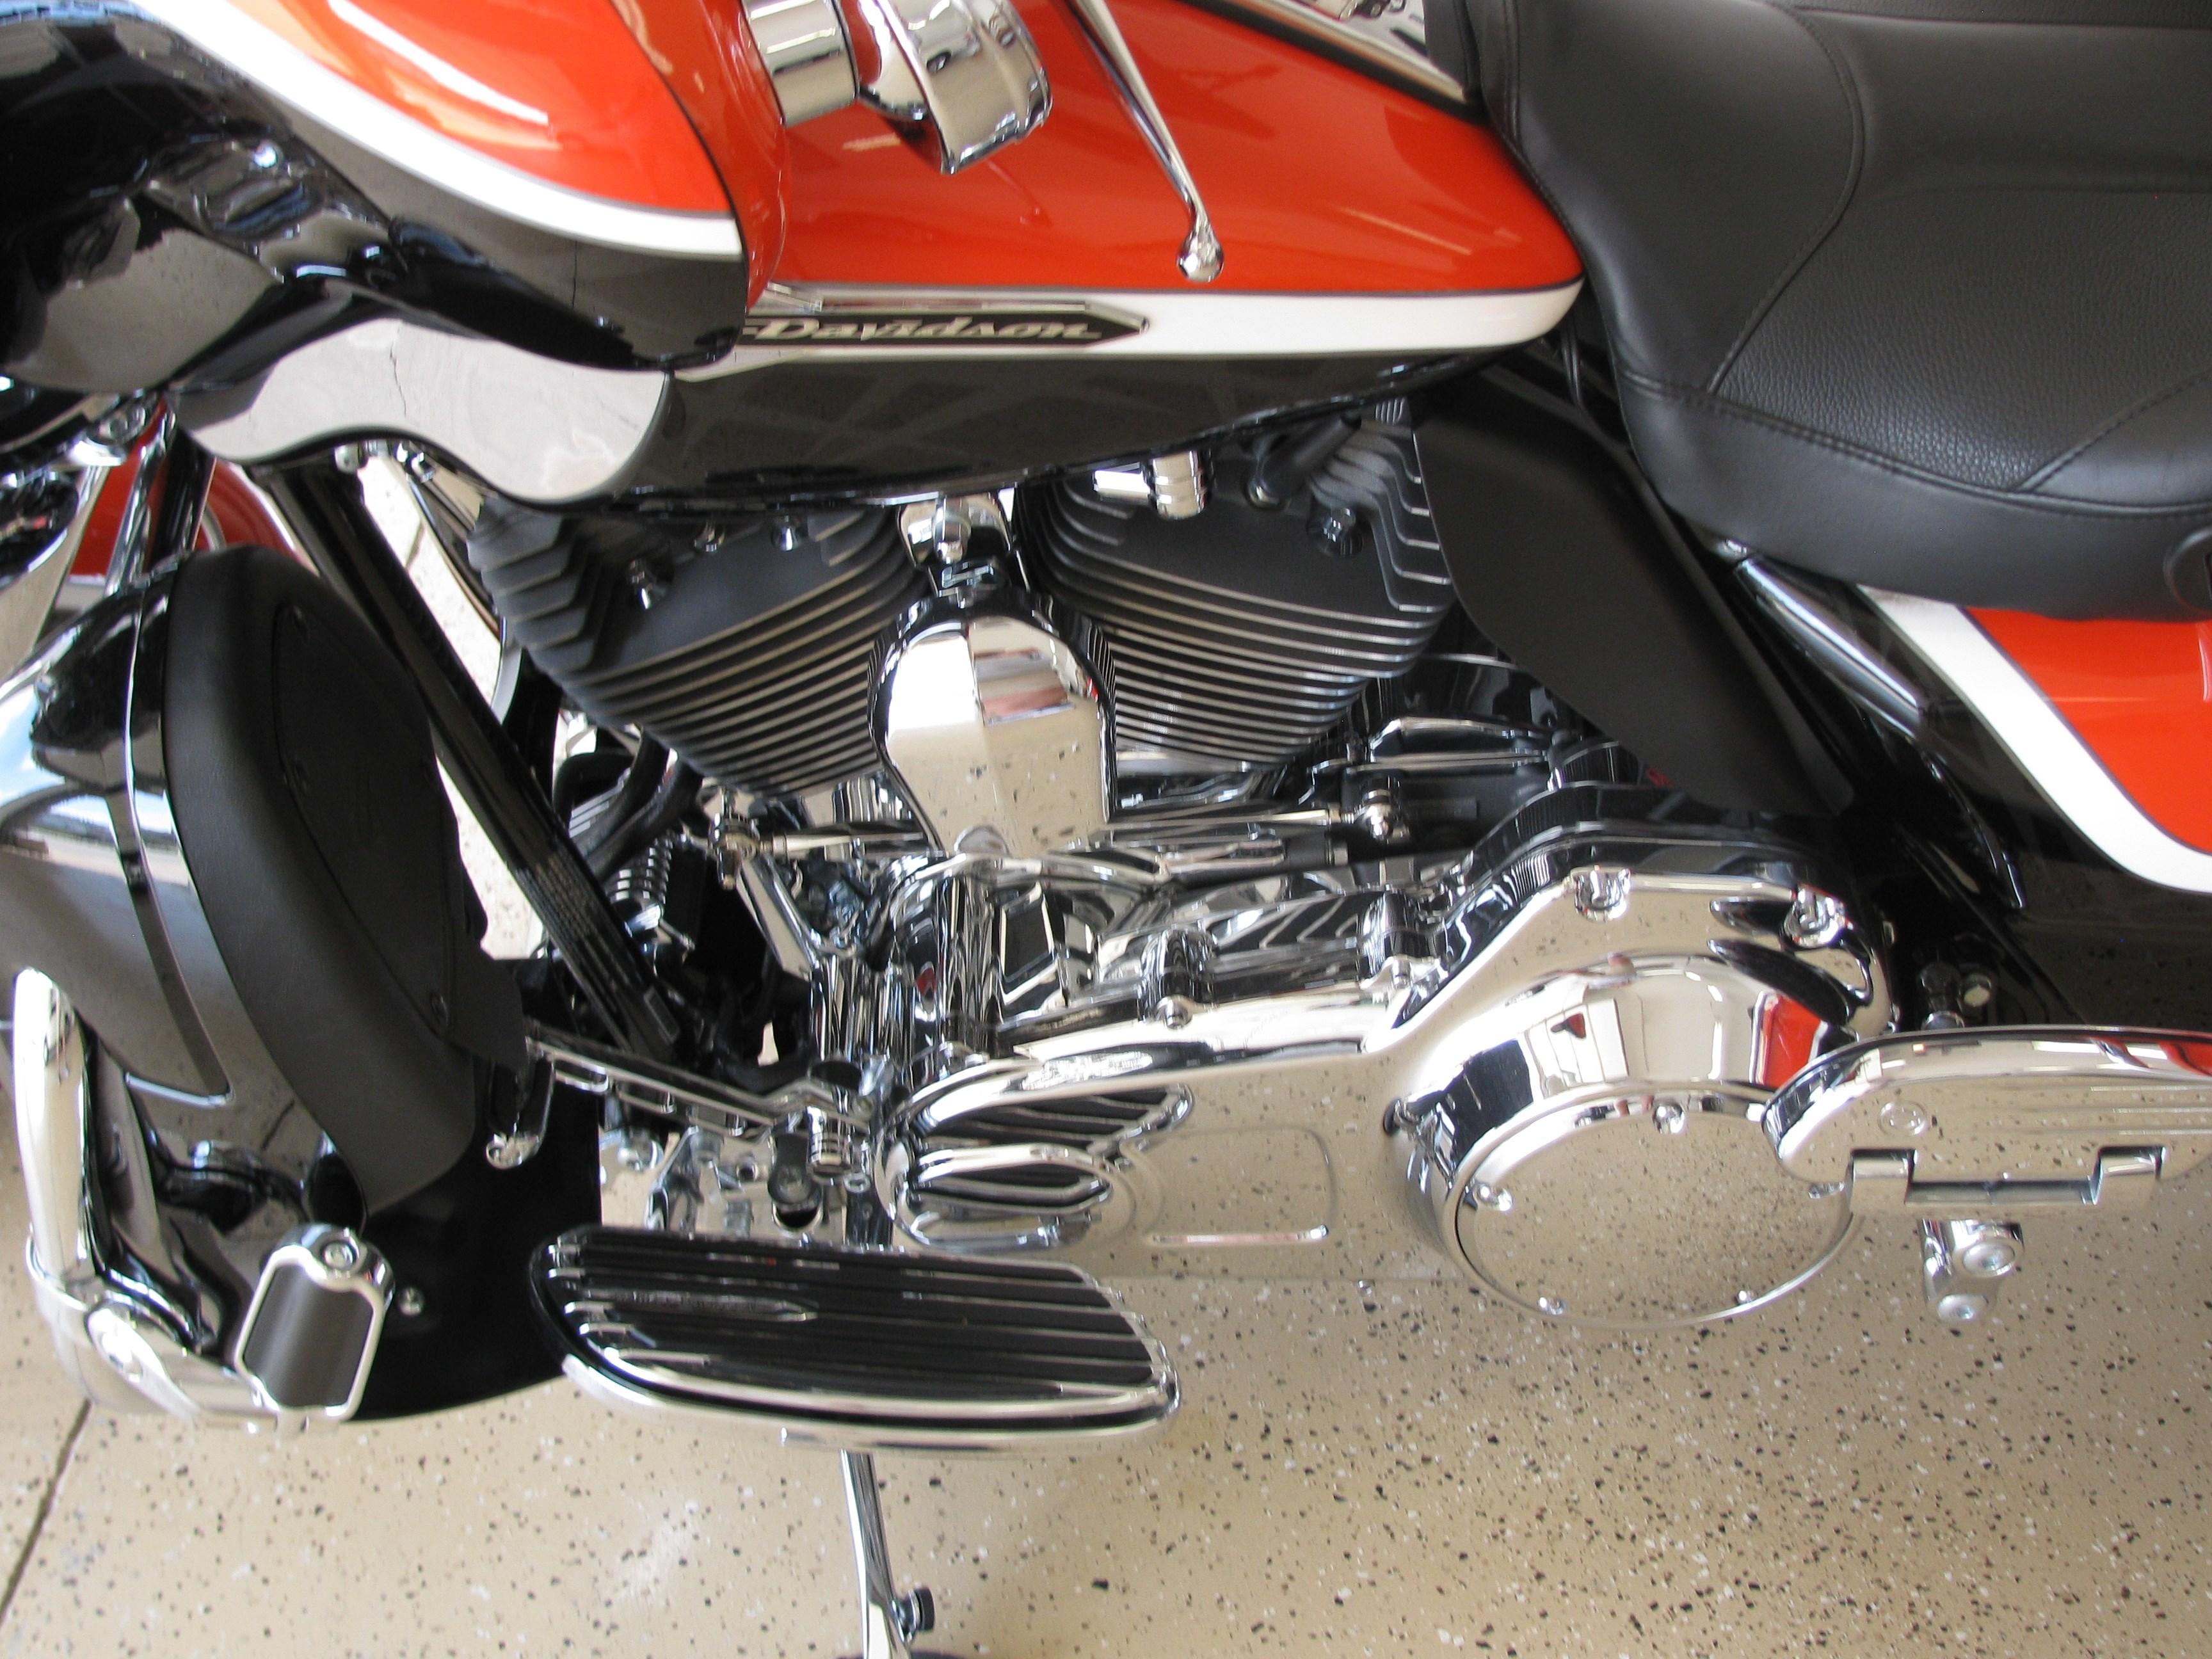 Harley Cvo Dealer Dallas Tx >> 2012 Harley-Davidson® FLHTCUSE7 CVO™ Ultra Classic® Electra Glide® (Orange/Black), Norwalk, Iowa ...